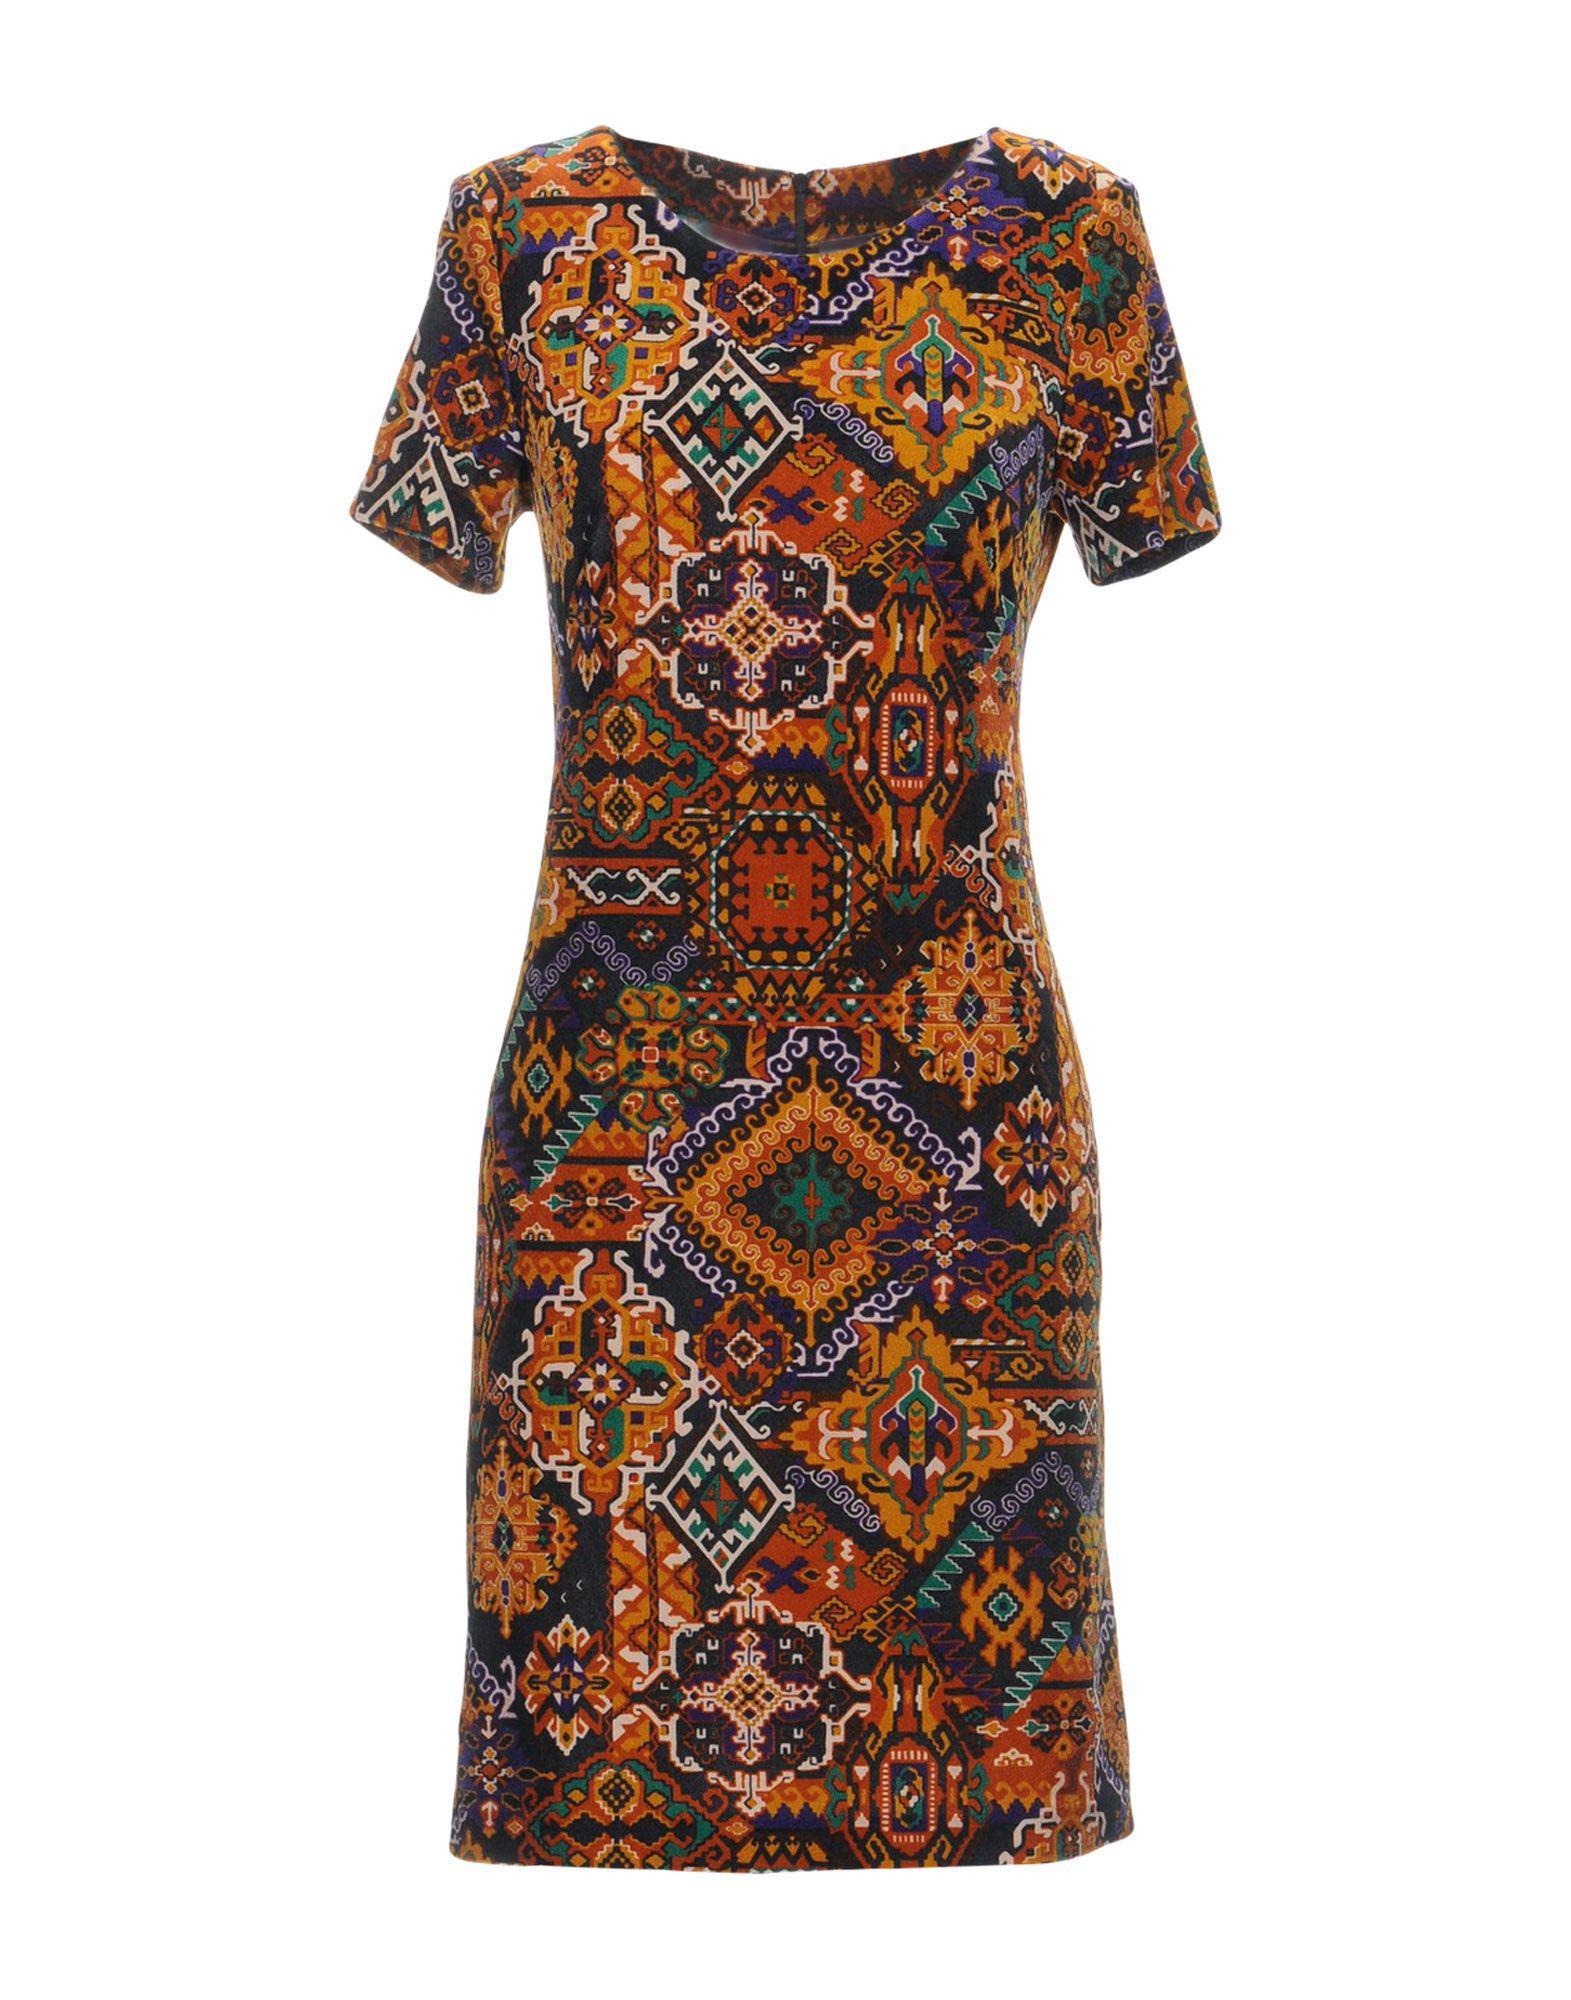 DRESSES - Short dresses Irie Wash VoY3nVz5x